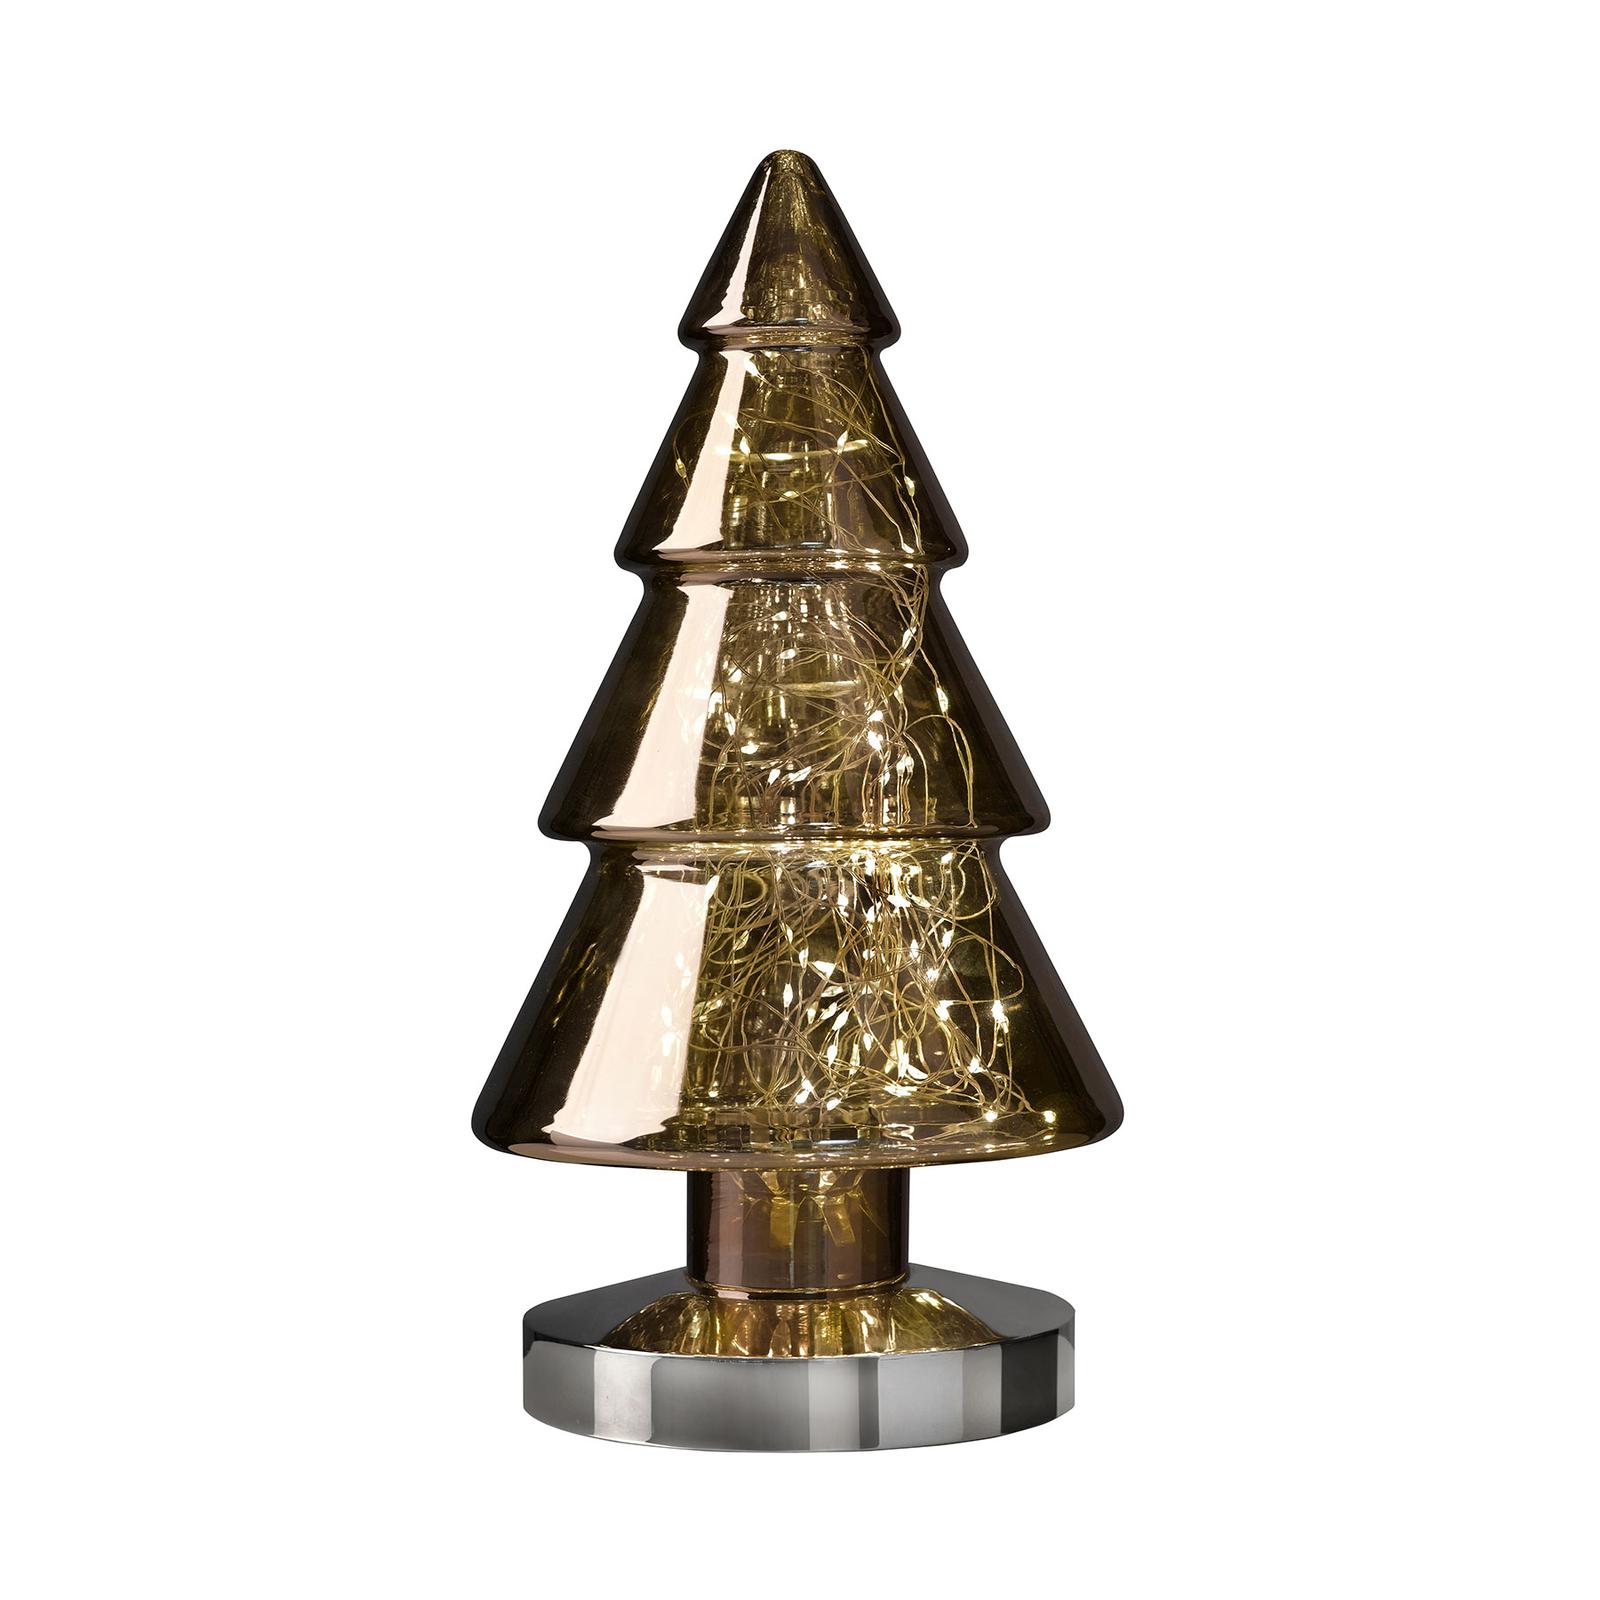 LED-dekorbelysning Ornament Baum, höjd 34 cm